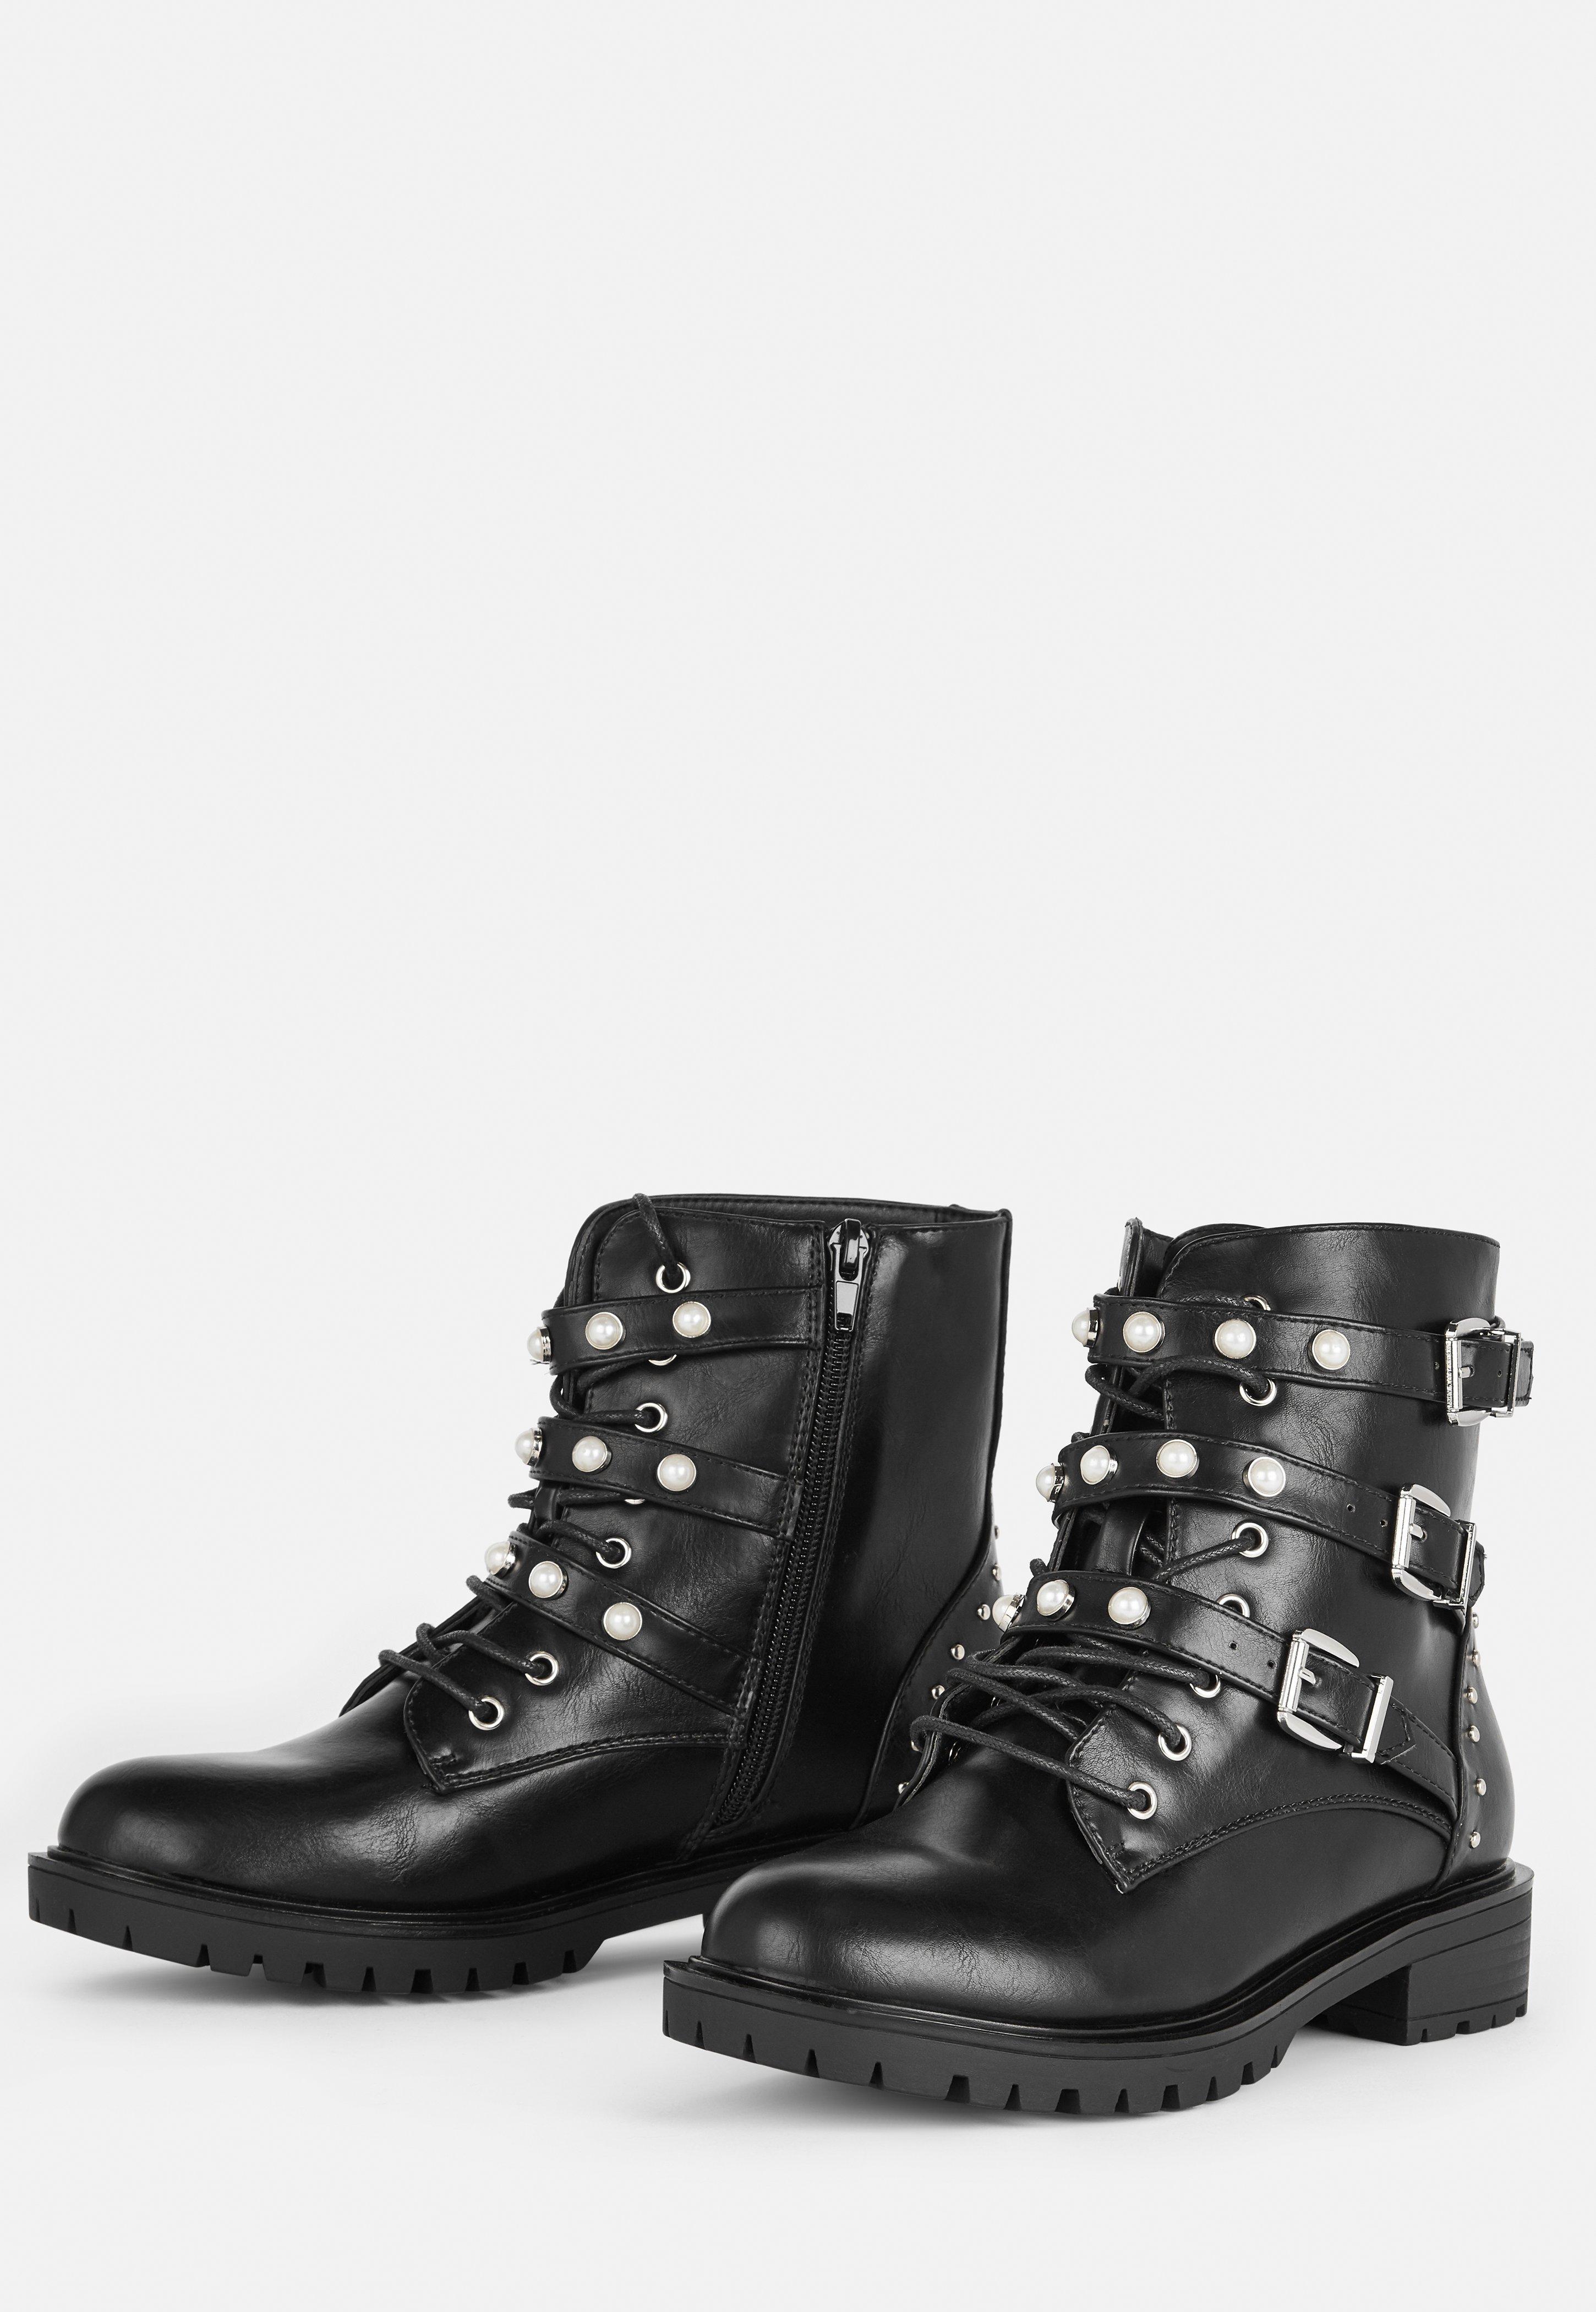 Womens Stud Faux Pearl Lace Biker Boots Black Ladies Size 7 New